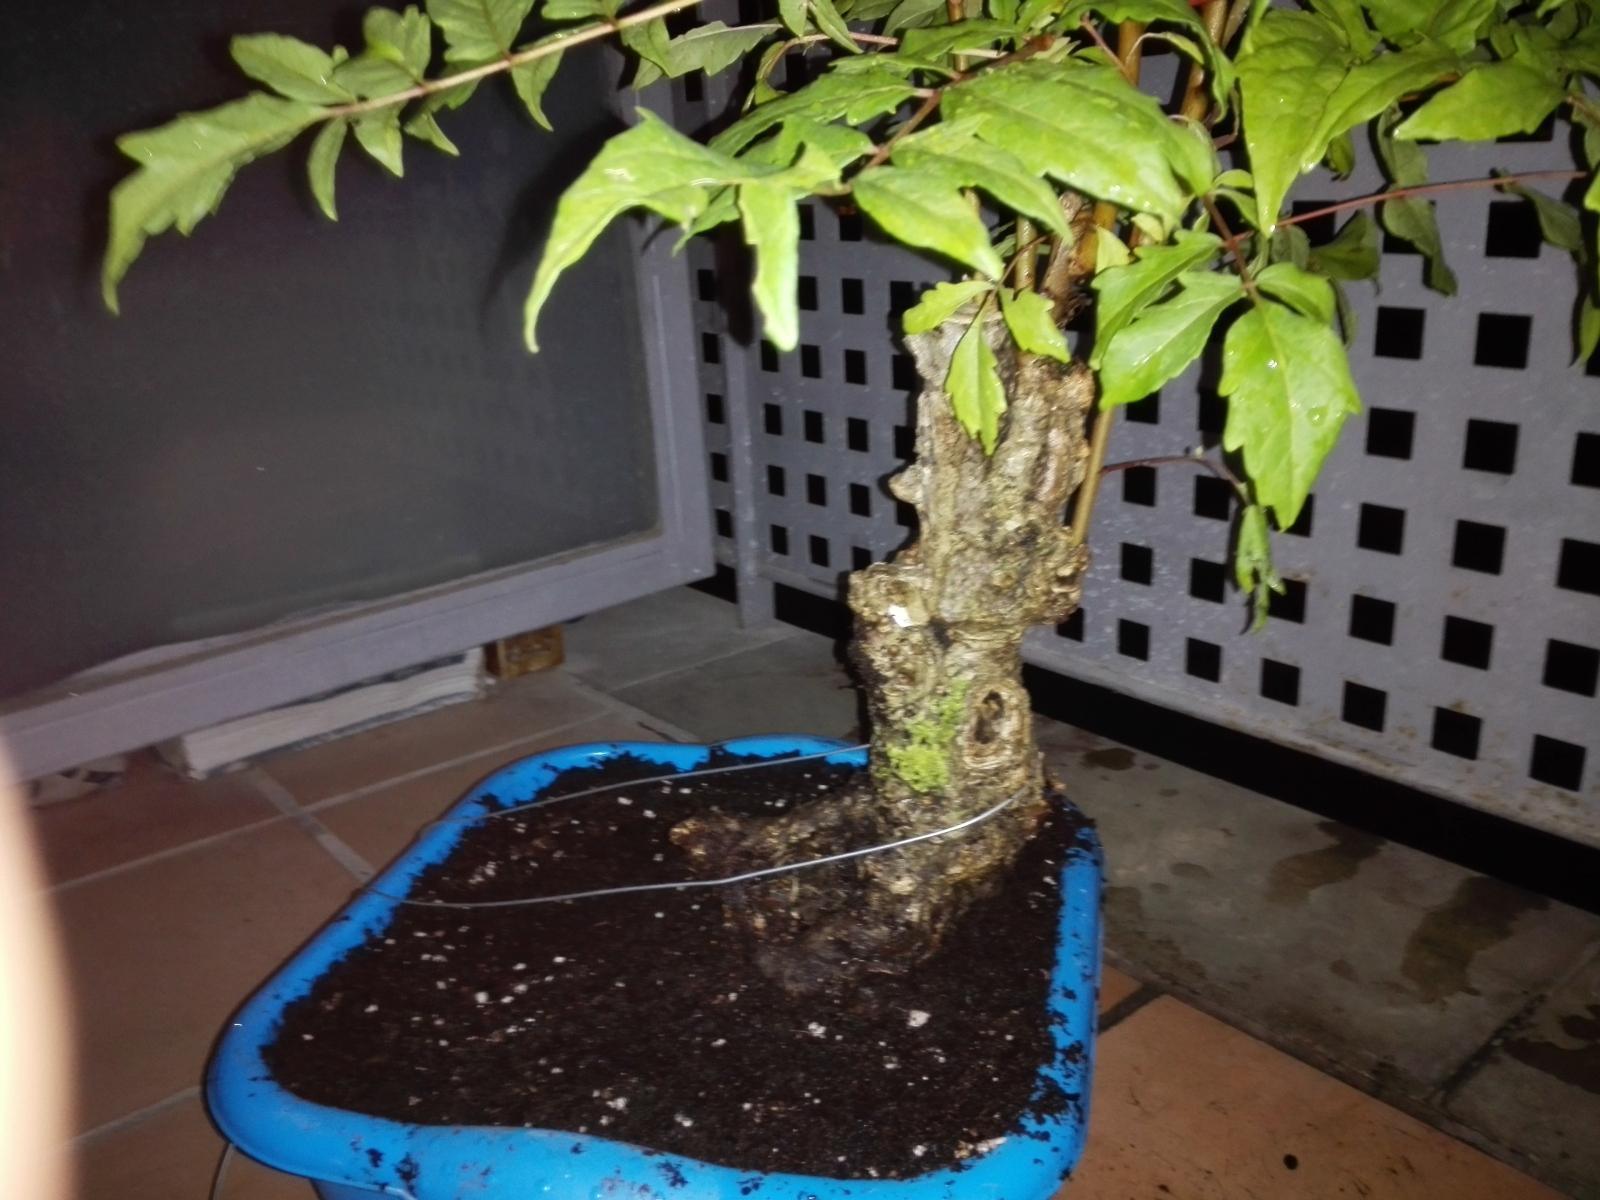 Recuperación, ailanthus altissima? 33c90n8